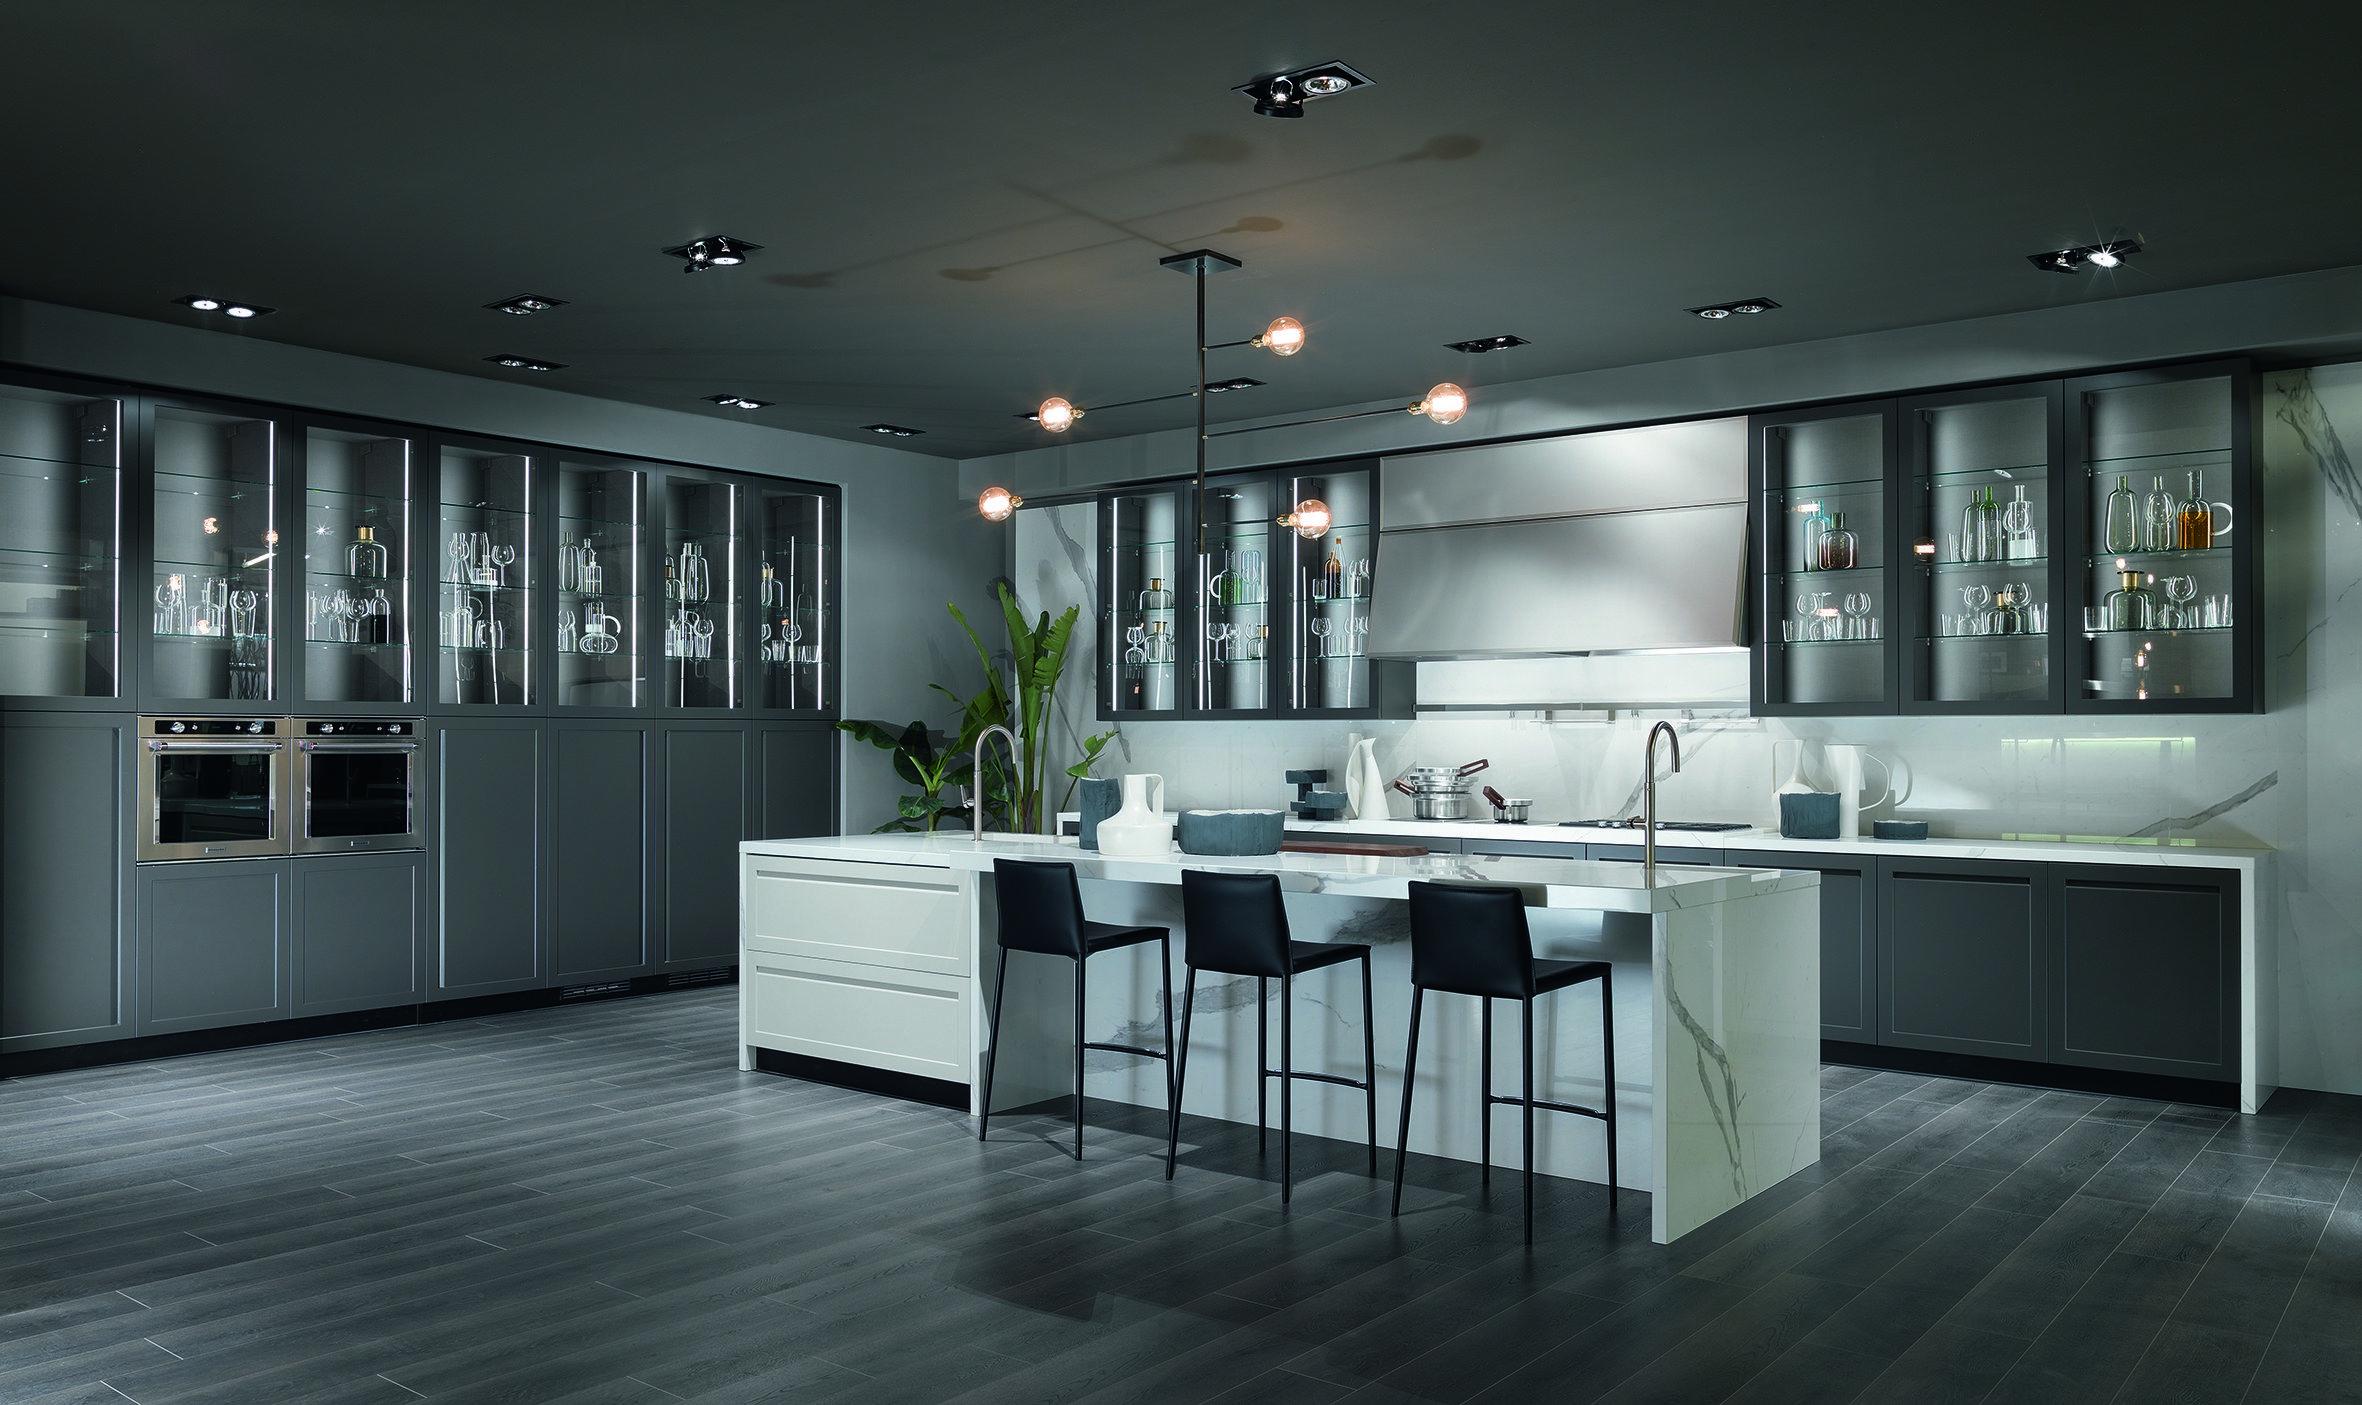 5 kitchen design ideas from salone del mobile 2016 | kitchen design